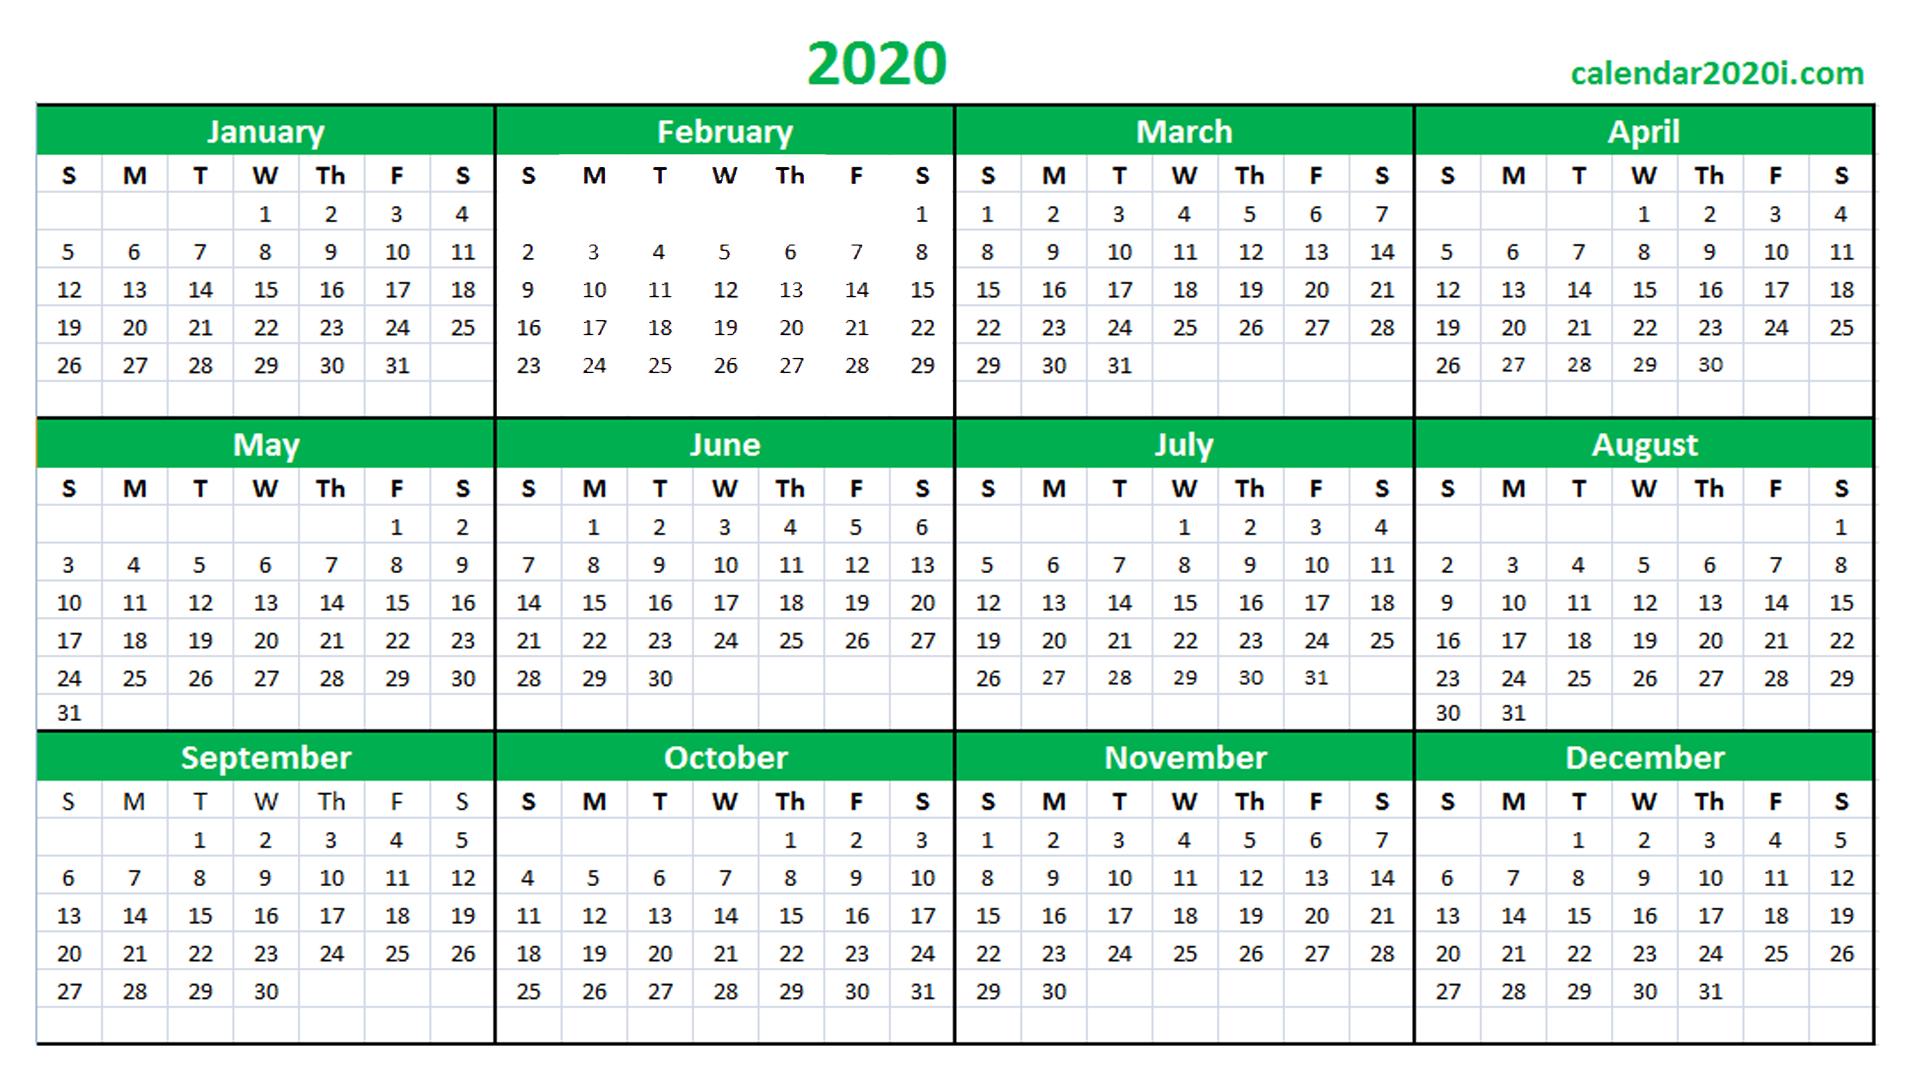 Calendars I Can Edit : Free Calendar Template Printable Calendar I Can Edit And Pring